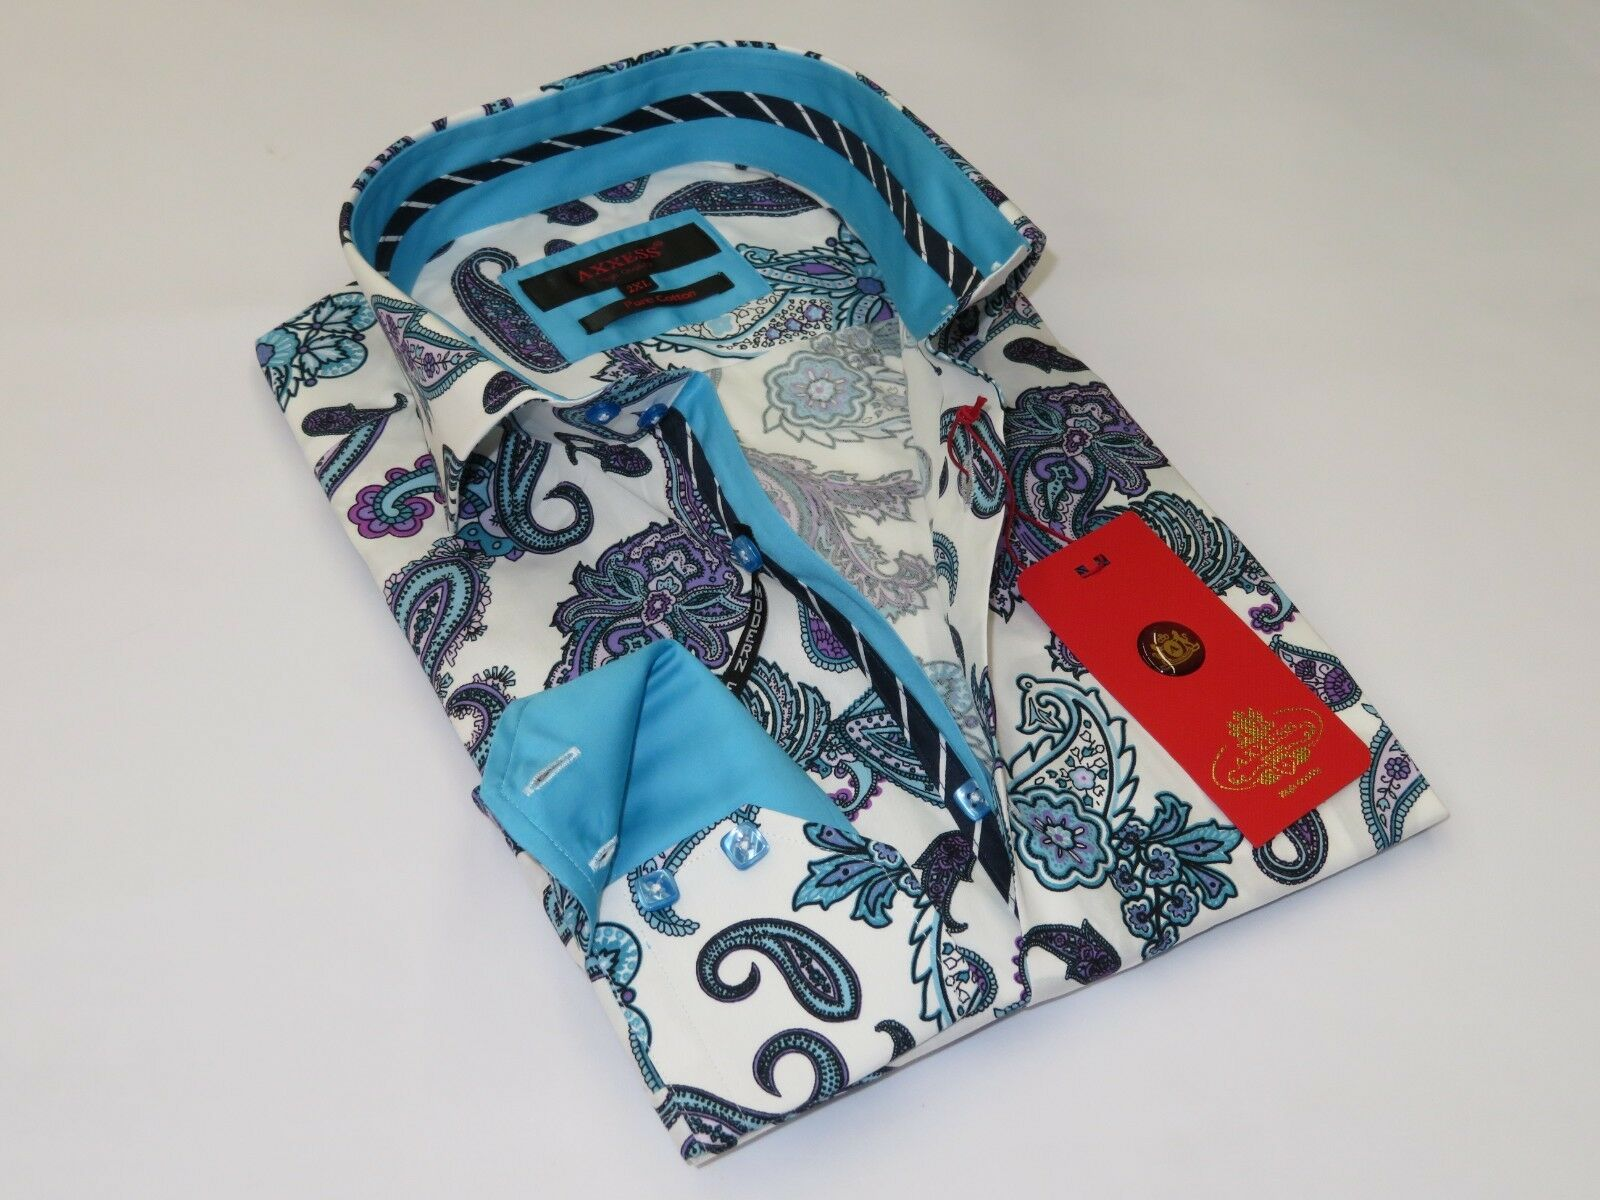 Herren Axxess Egyptian Cotton European Shirt High Collar 818-06 Teal Blau Paisley